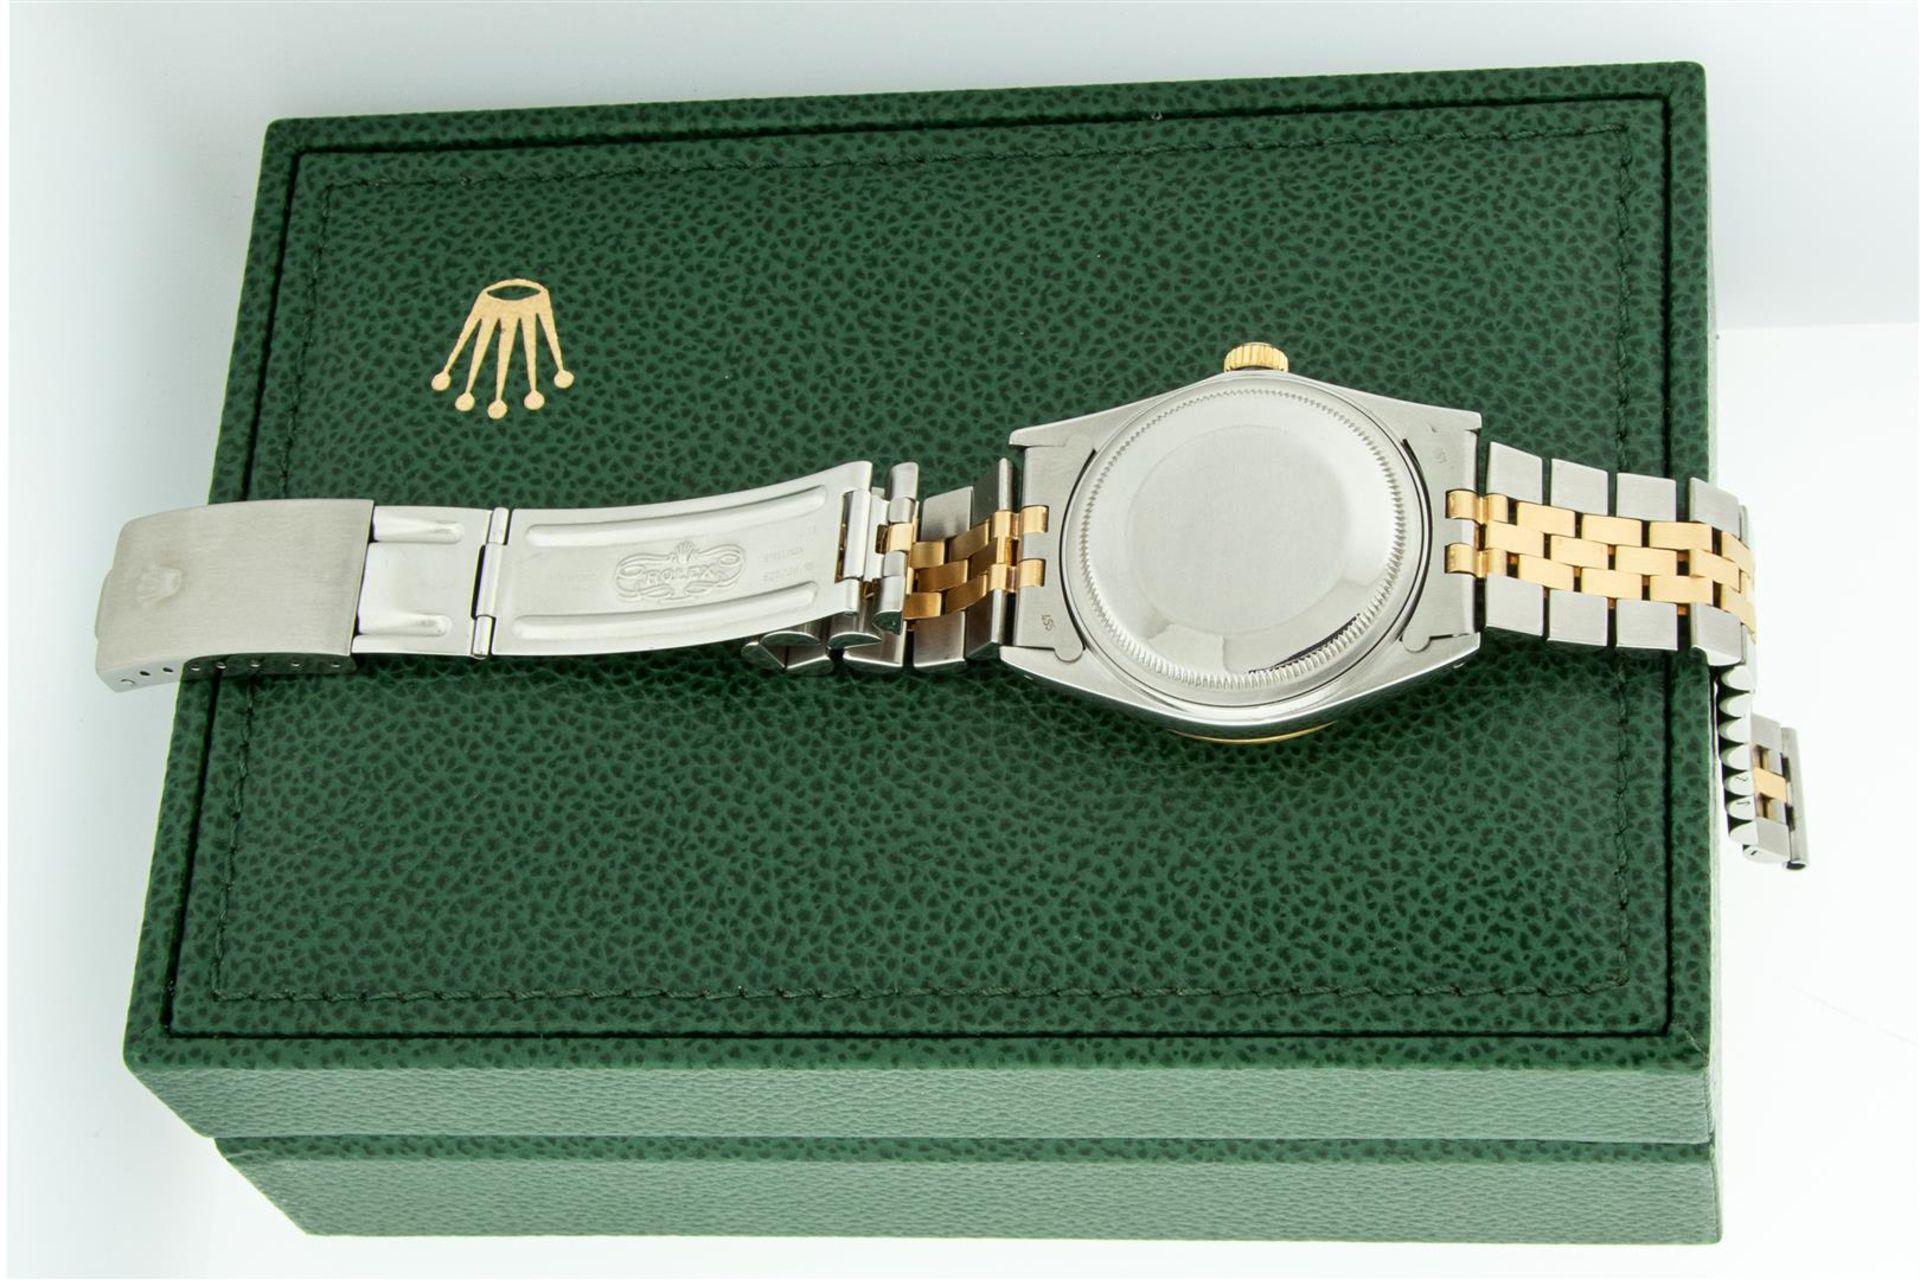 Rolex Mens 2 Tone MOP Diamond Lugs 36MM Datejust Wristwatch - Image 8 of 9